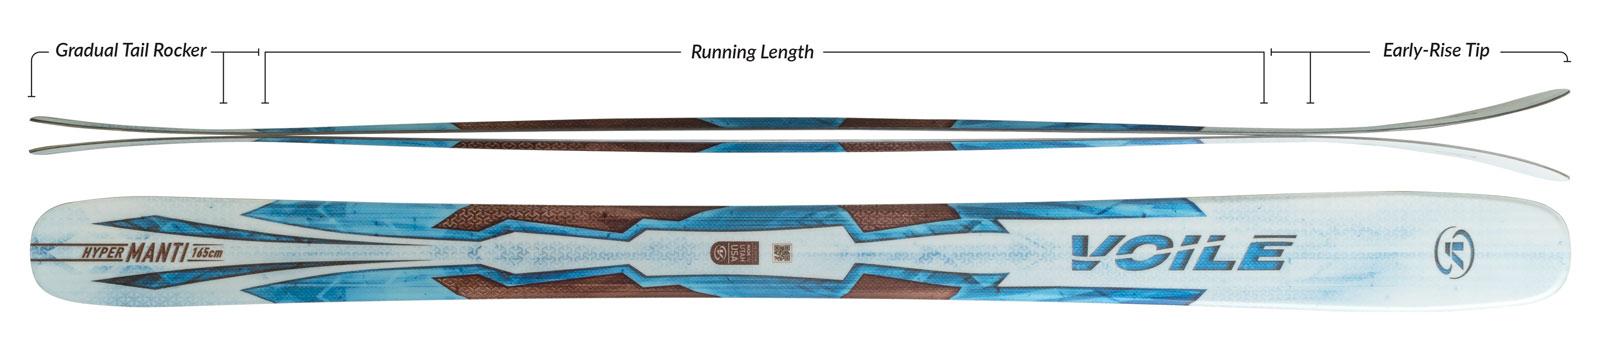 Voile Women's Hyper Manti Skis Camber Profile